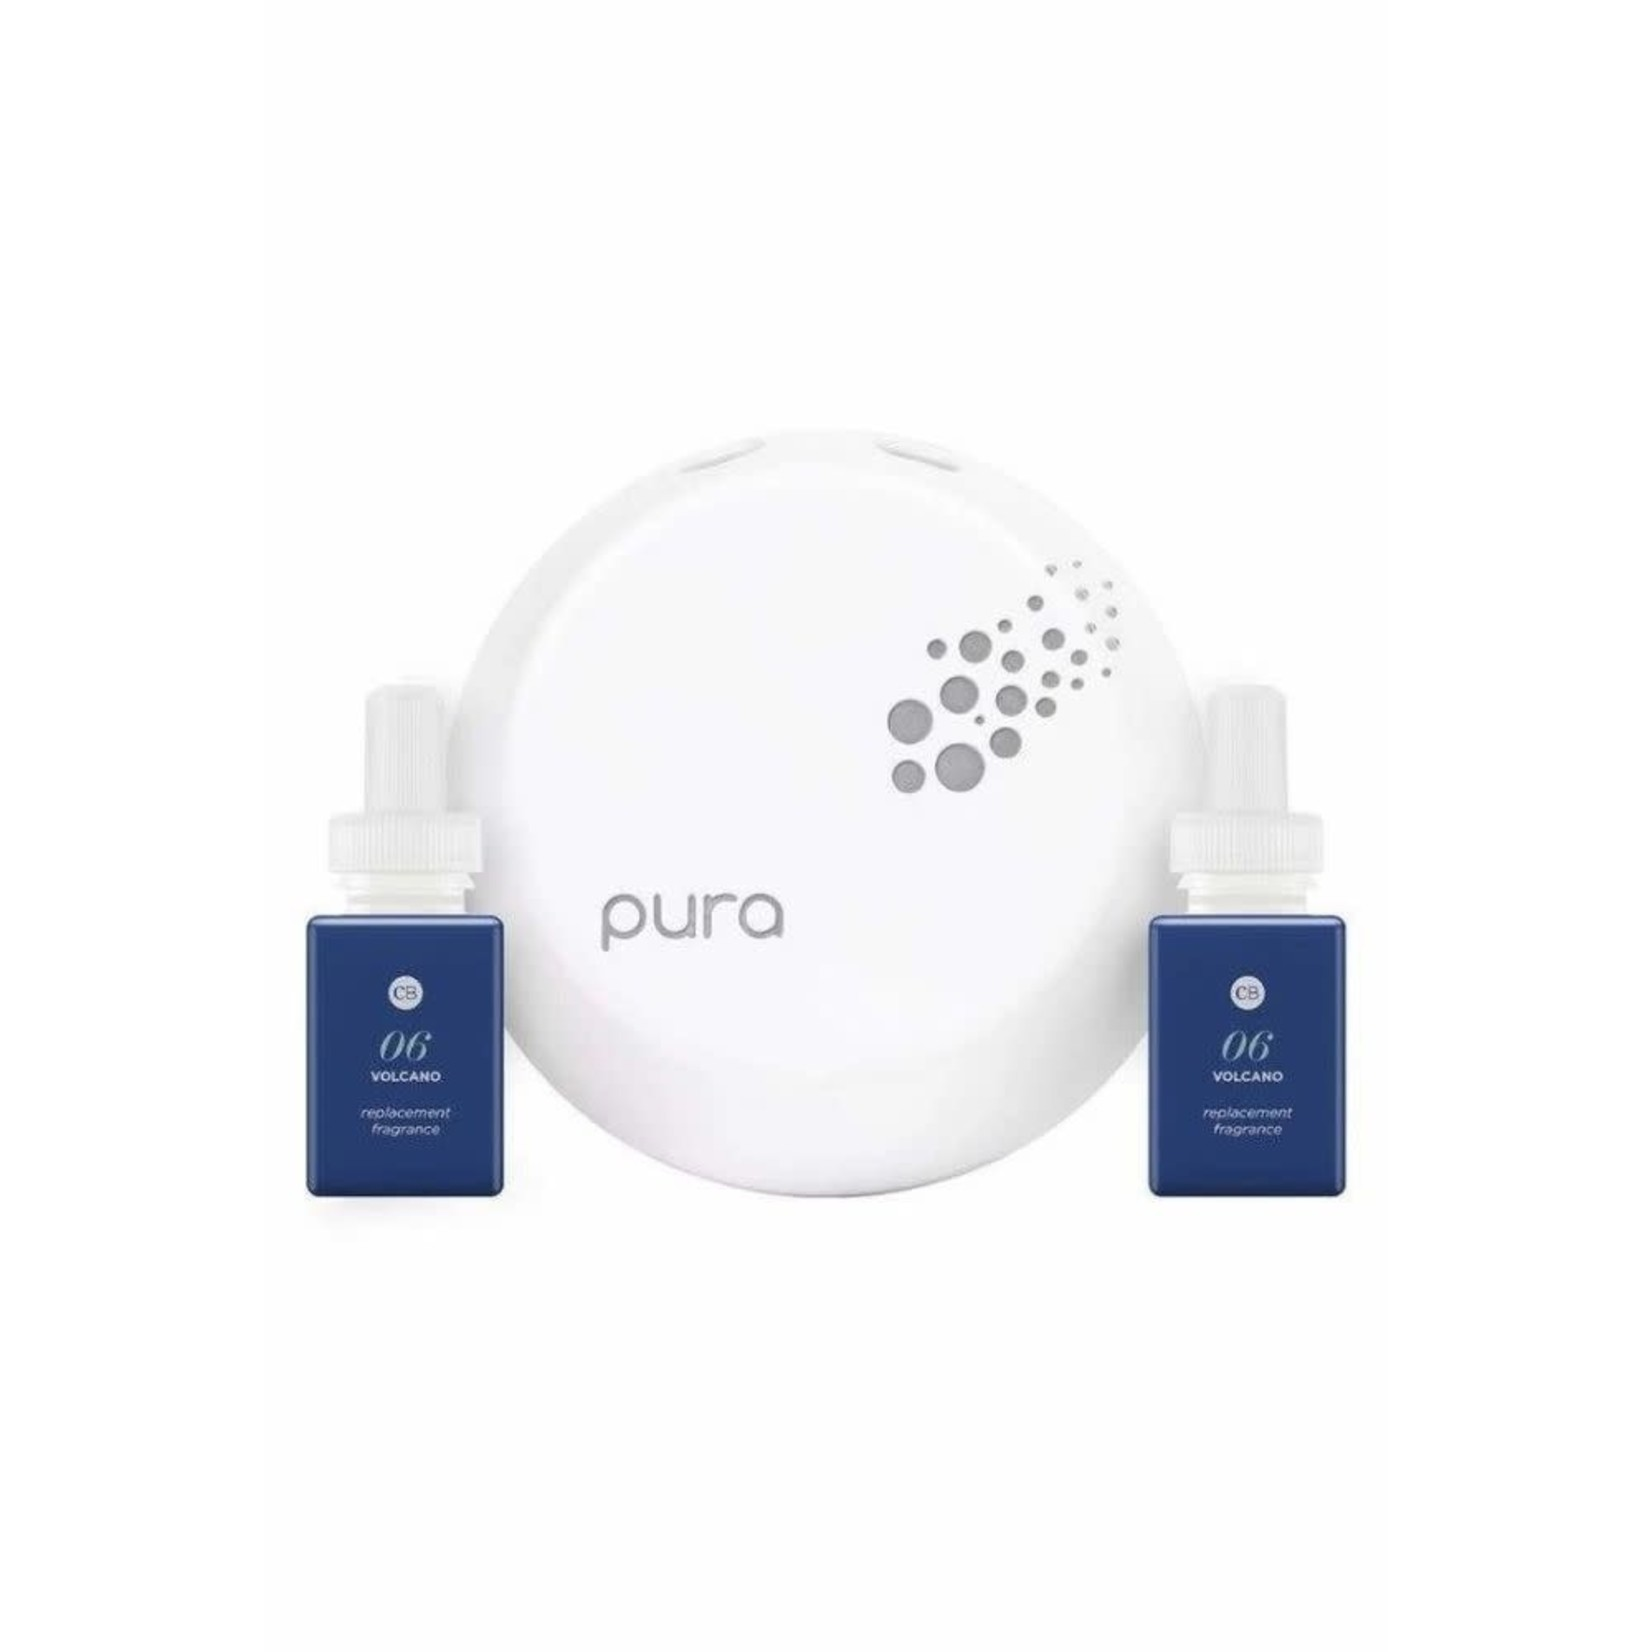 Capri Blue Pure Home Diffuser Kit